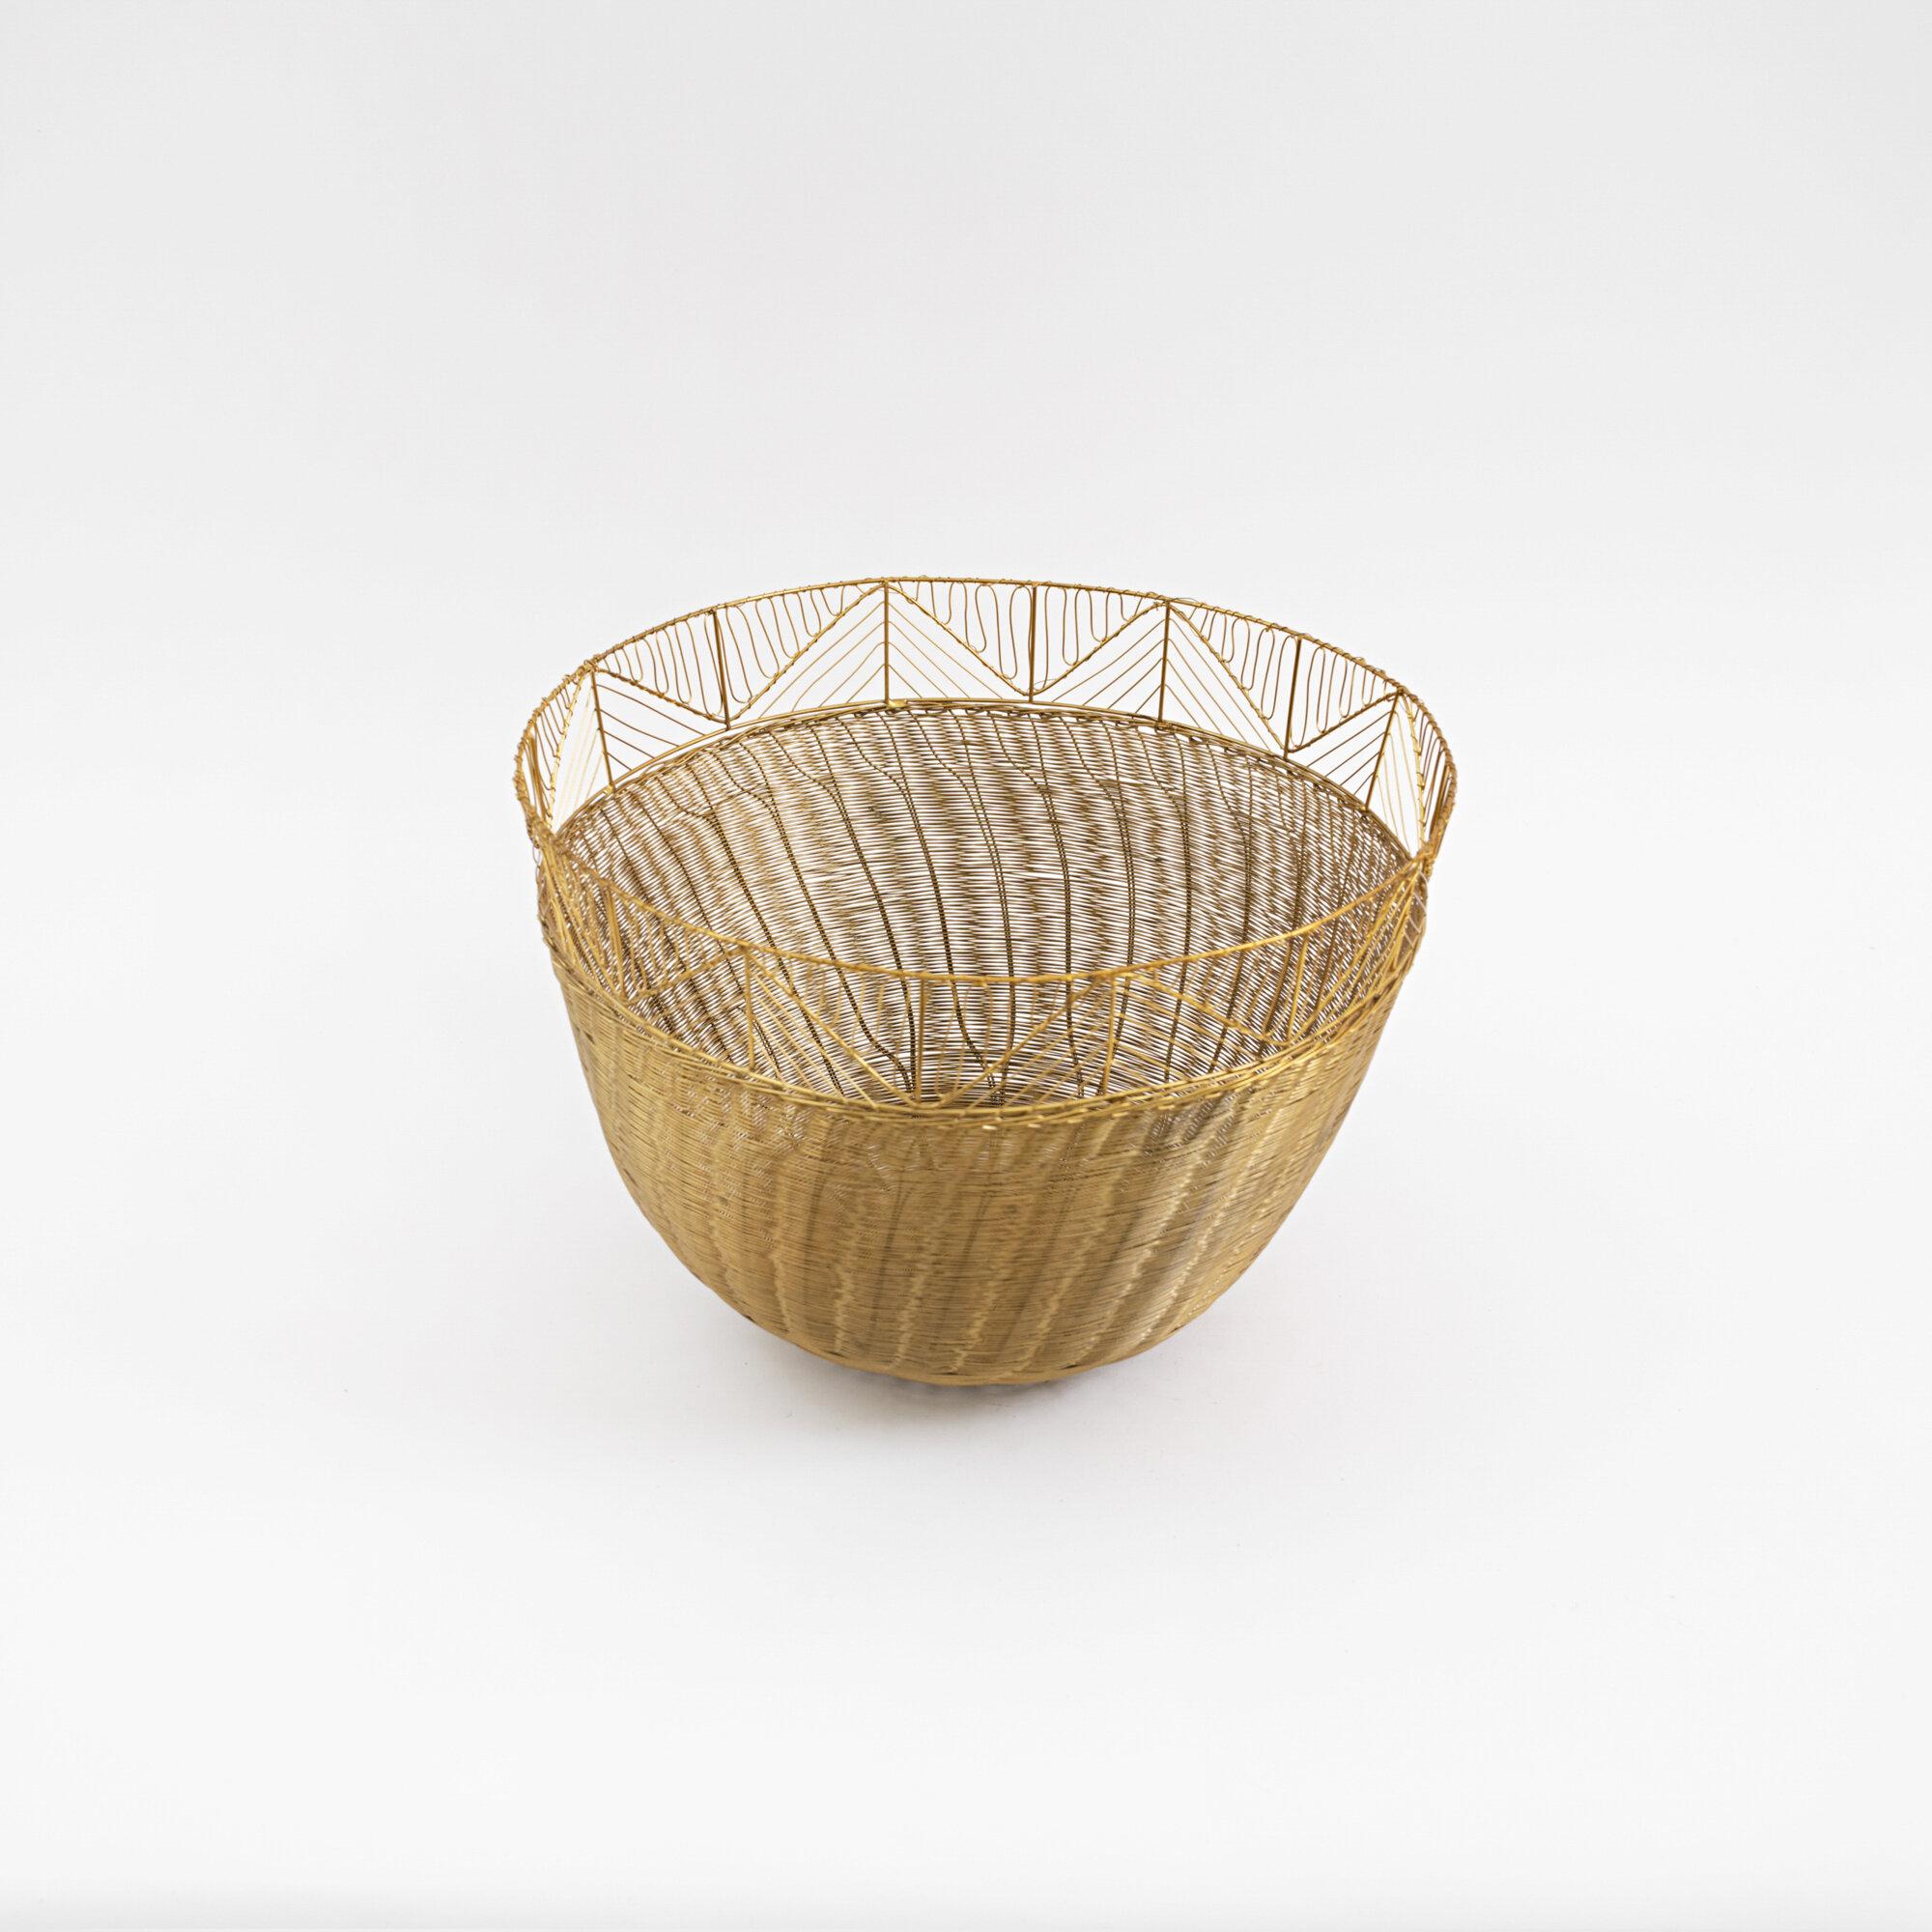 23-shop-mayker-home-gifting-design-decor-nashville-home-accents-baskets-web-res.jpg